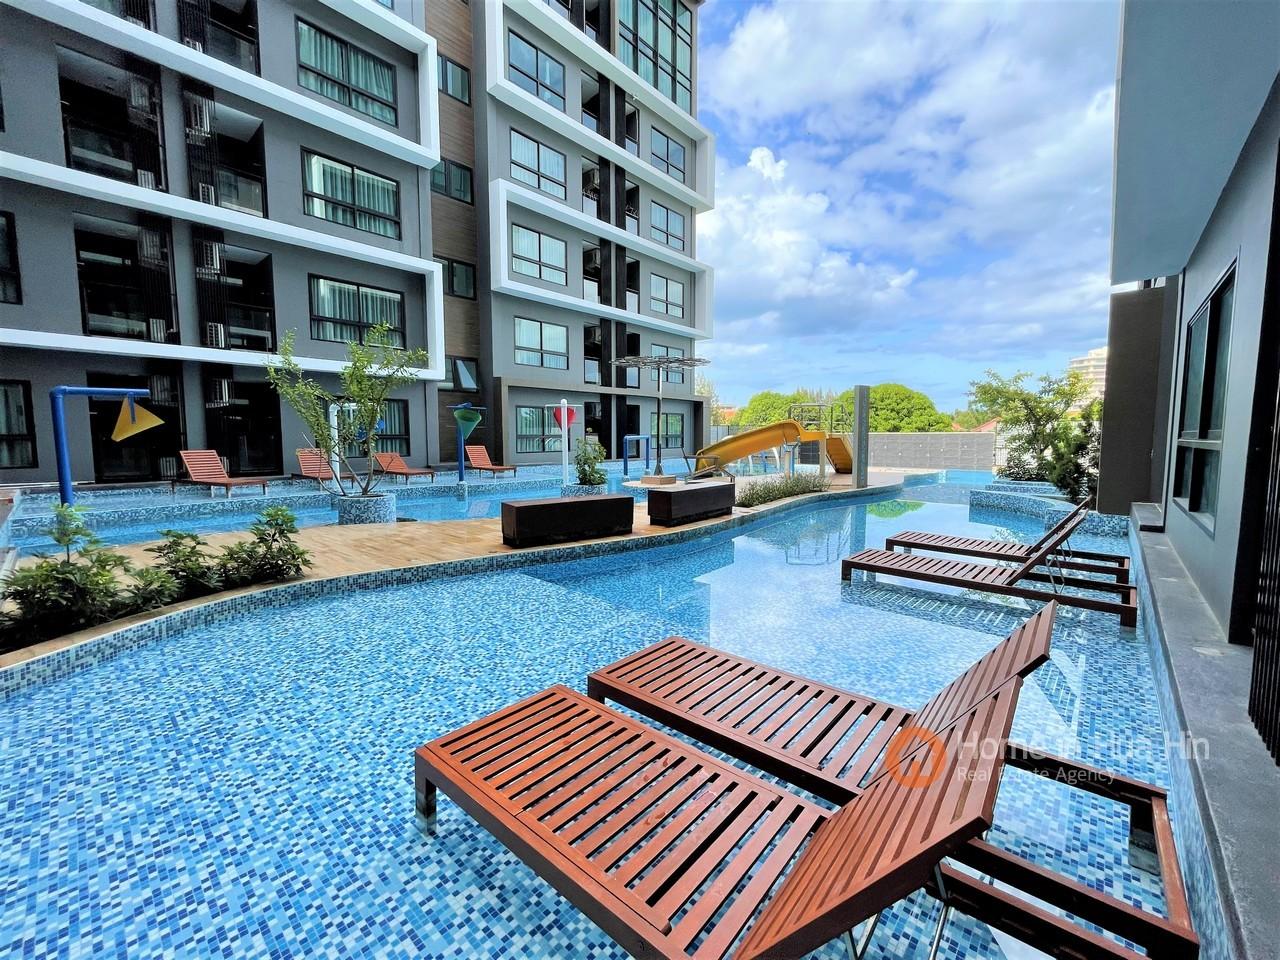 2 Bedroom Hua Hin Condo Apartment for SALE